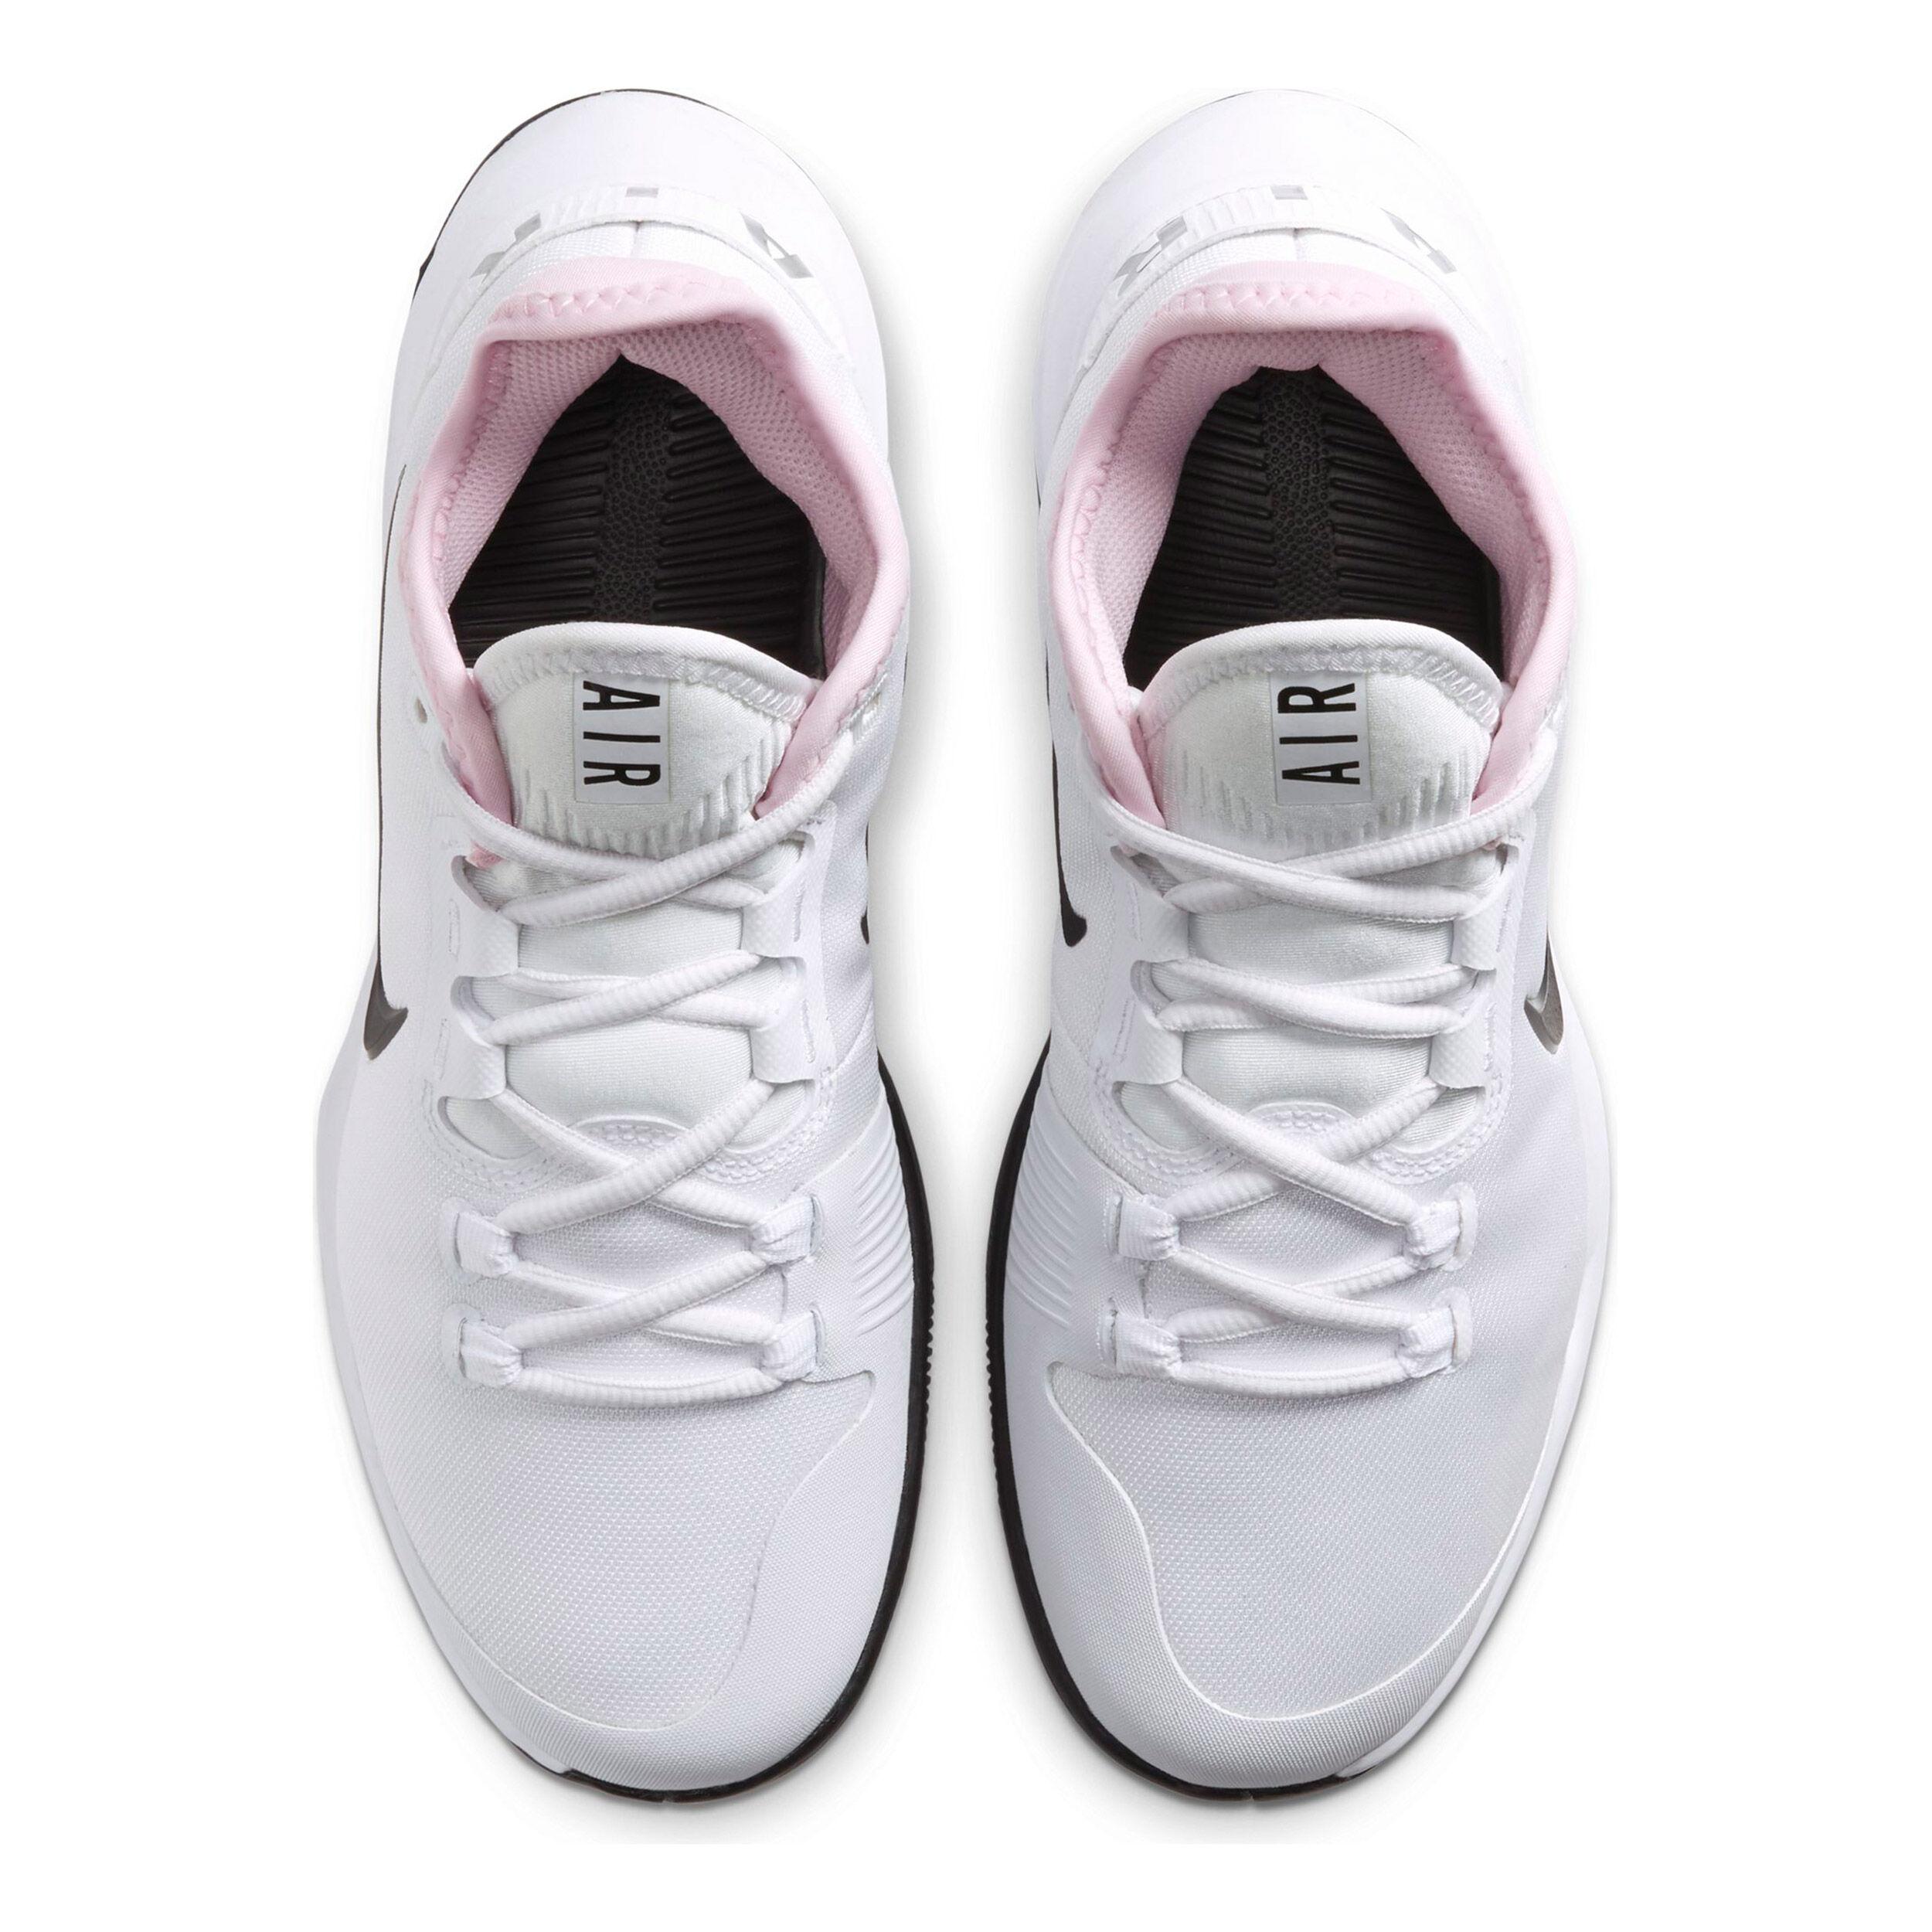 Nike Air Max Wildcard Allcourtschuh Damen Weiß, Rosa